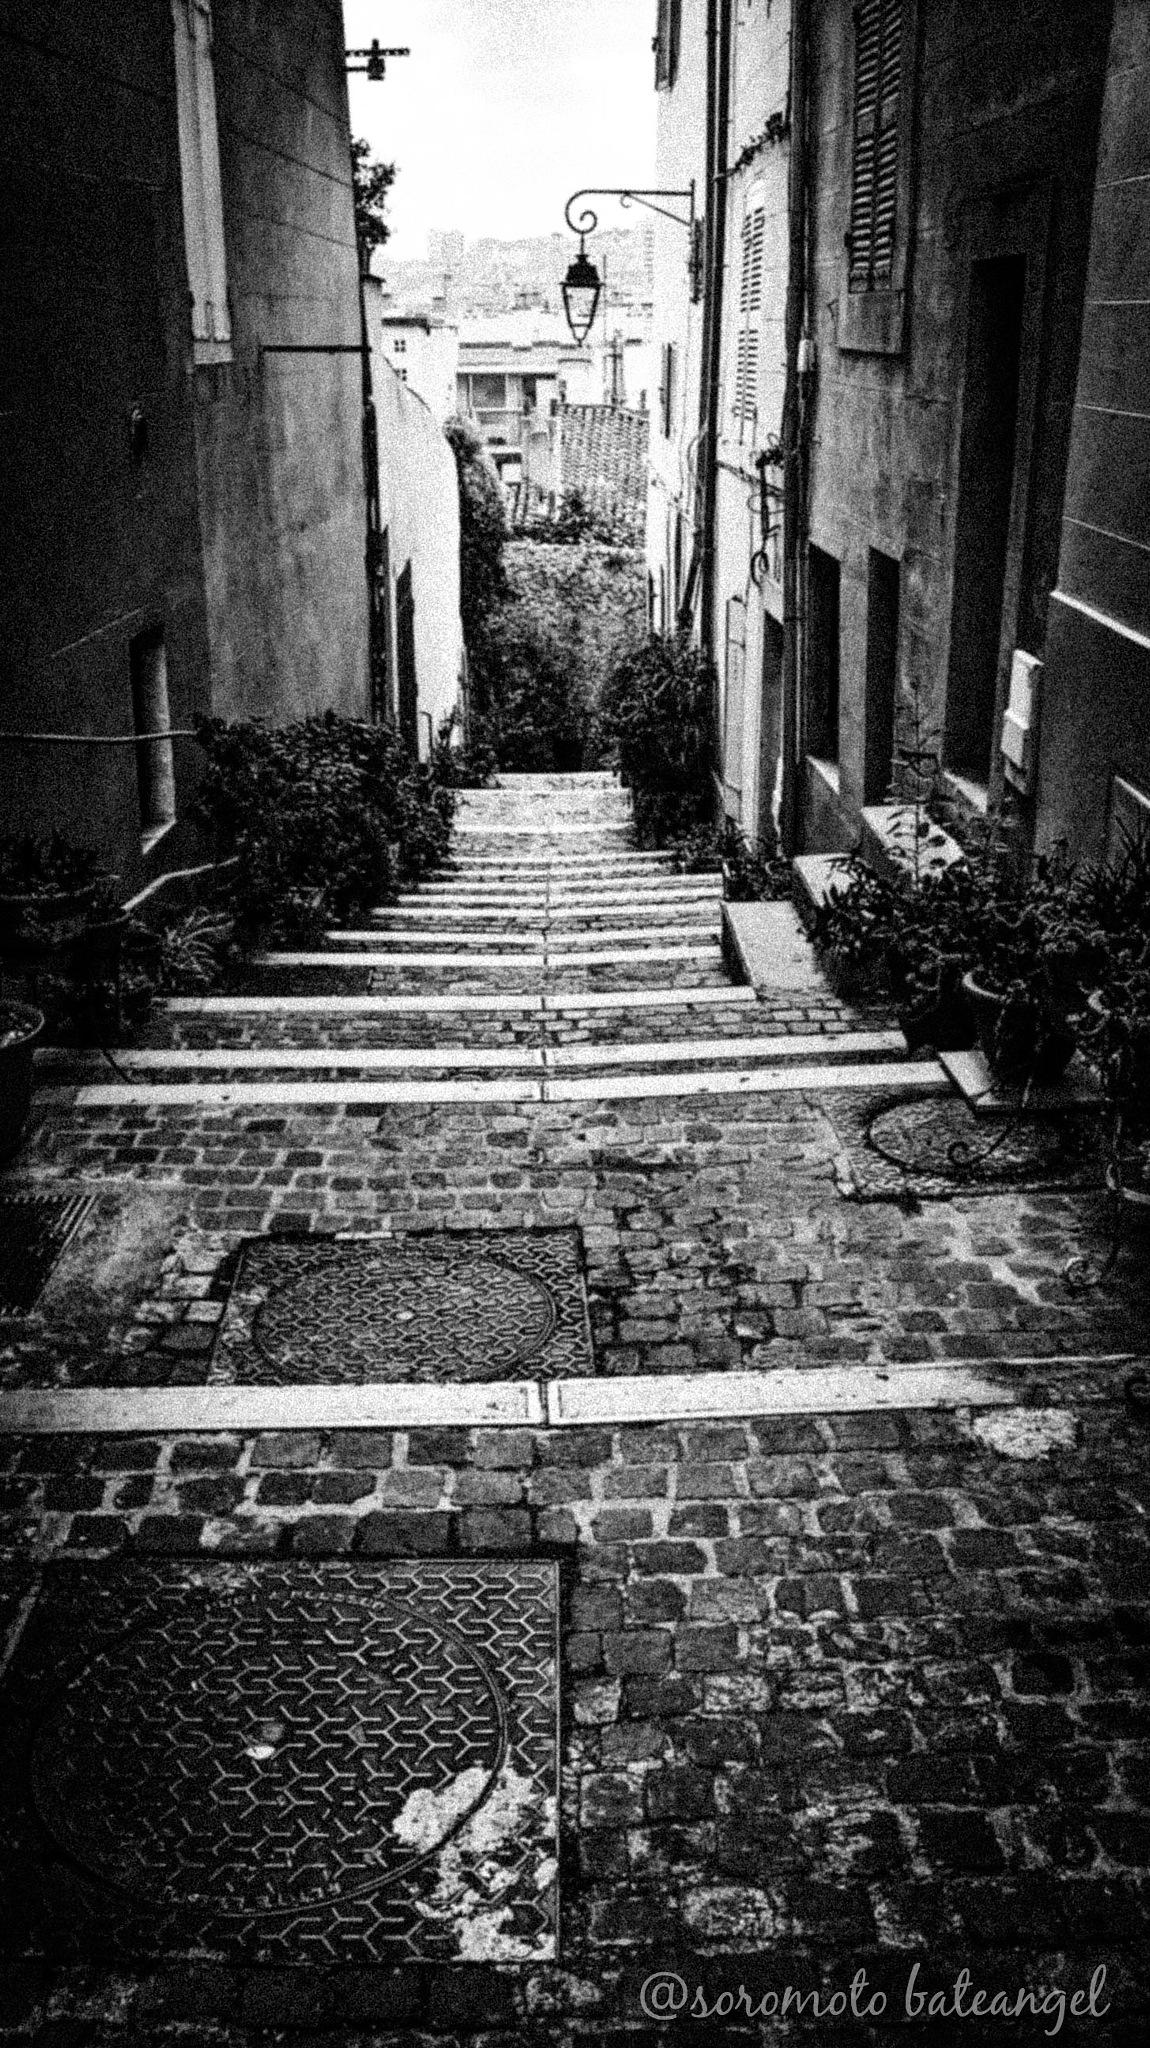 Marseille has it's own charm..... by Soromoto Bateangel